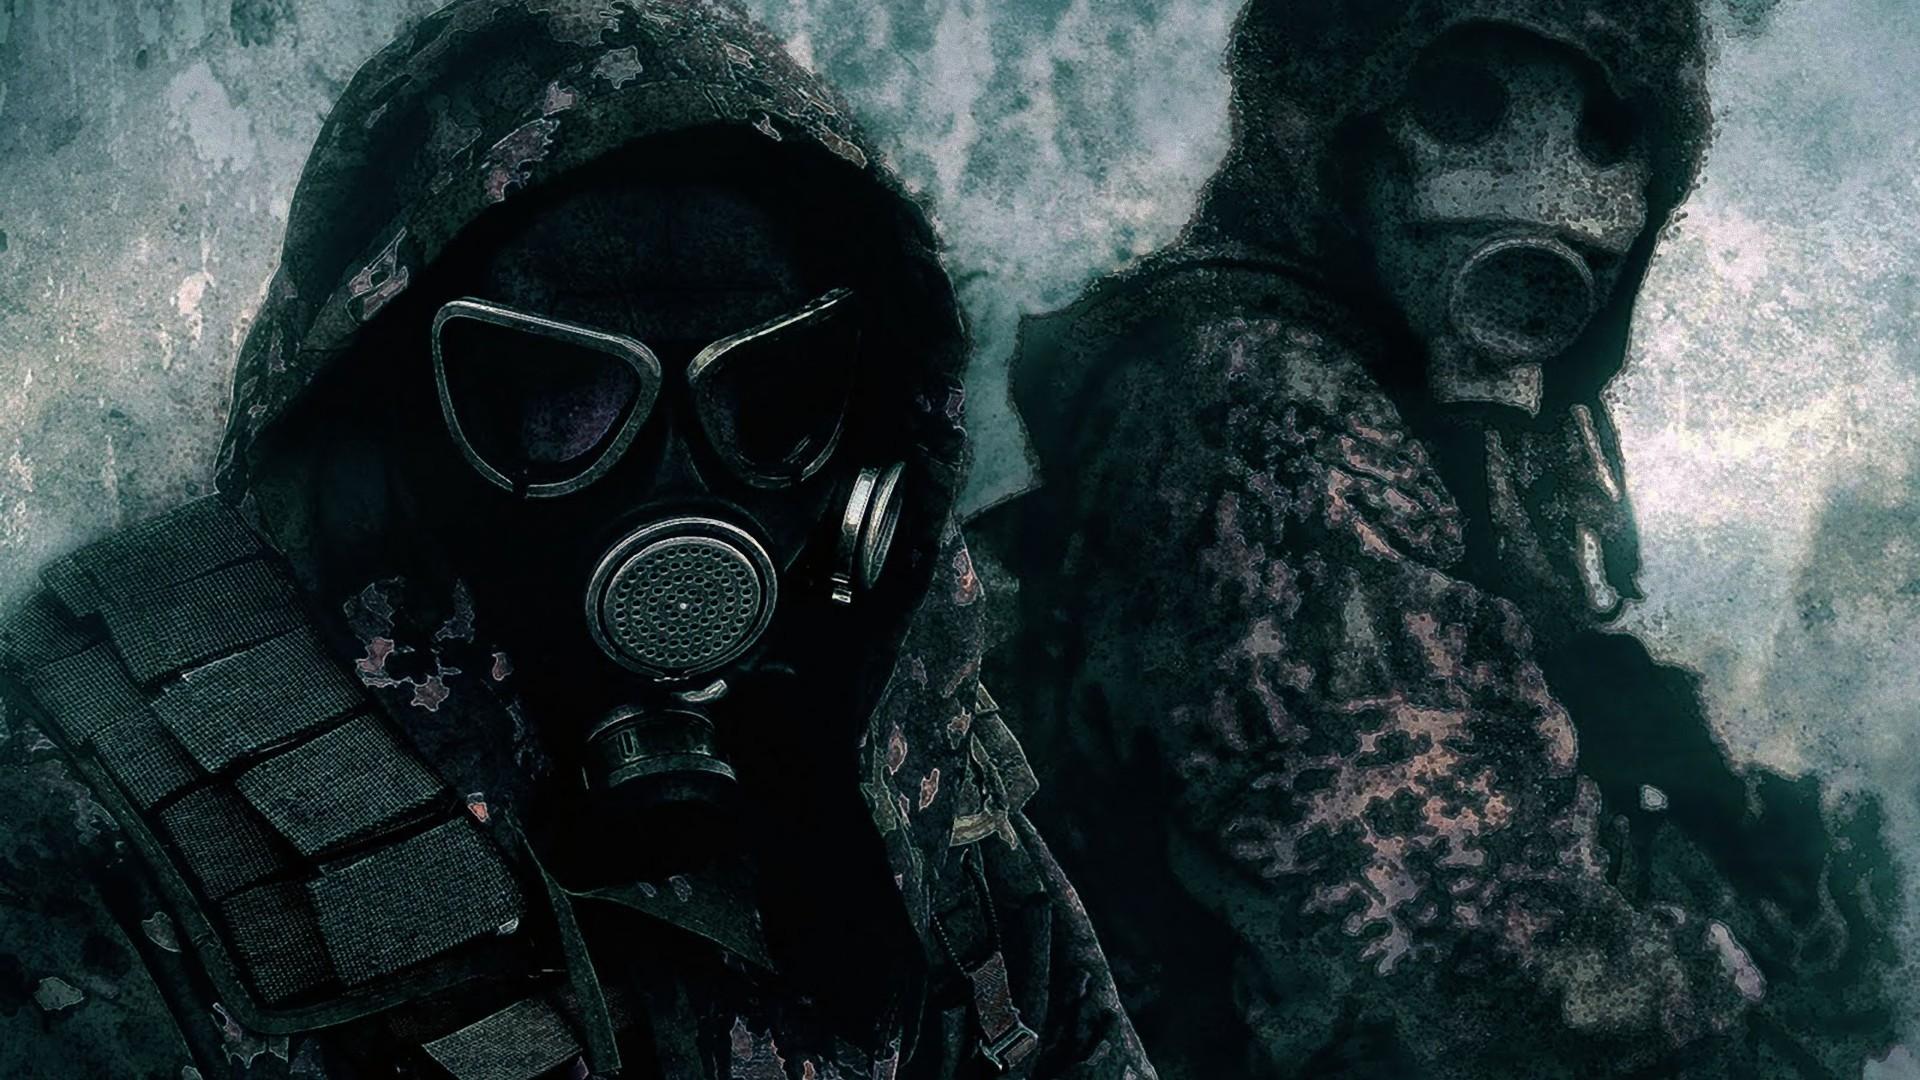 Gas Mask HD Wallpaper | Background Image | 1920x1080 | ID ...